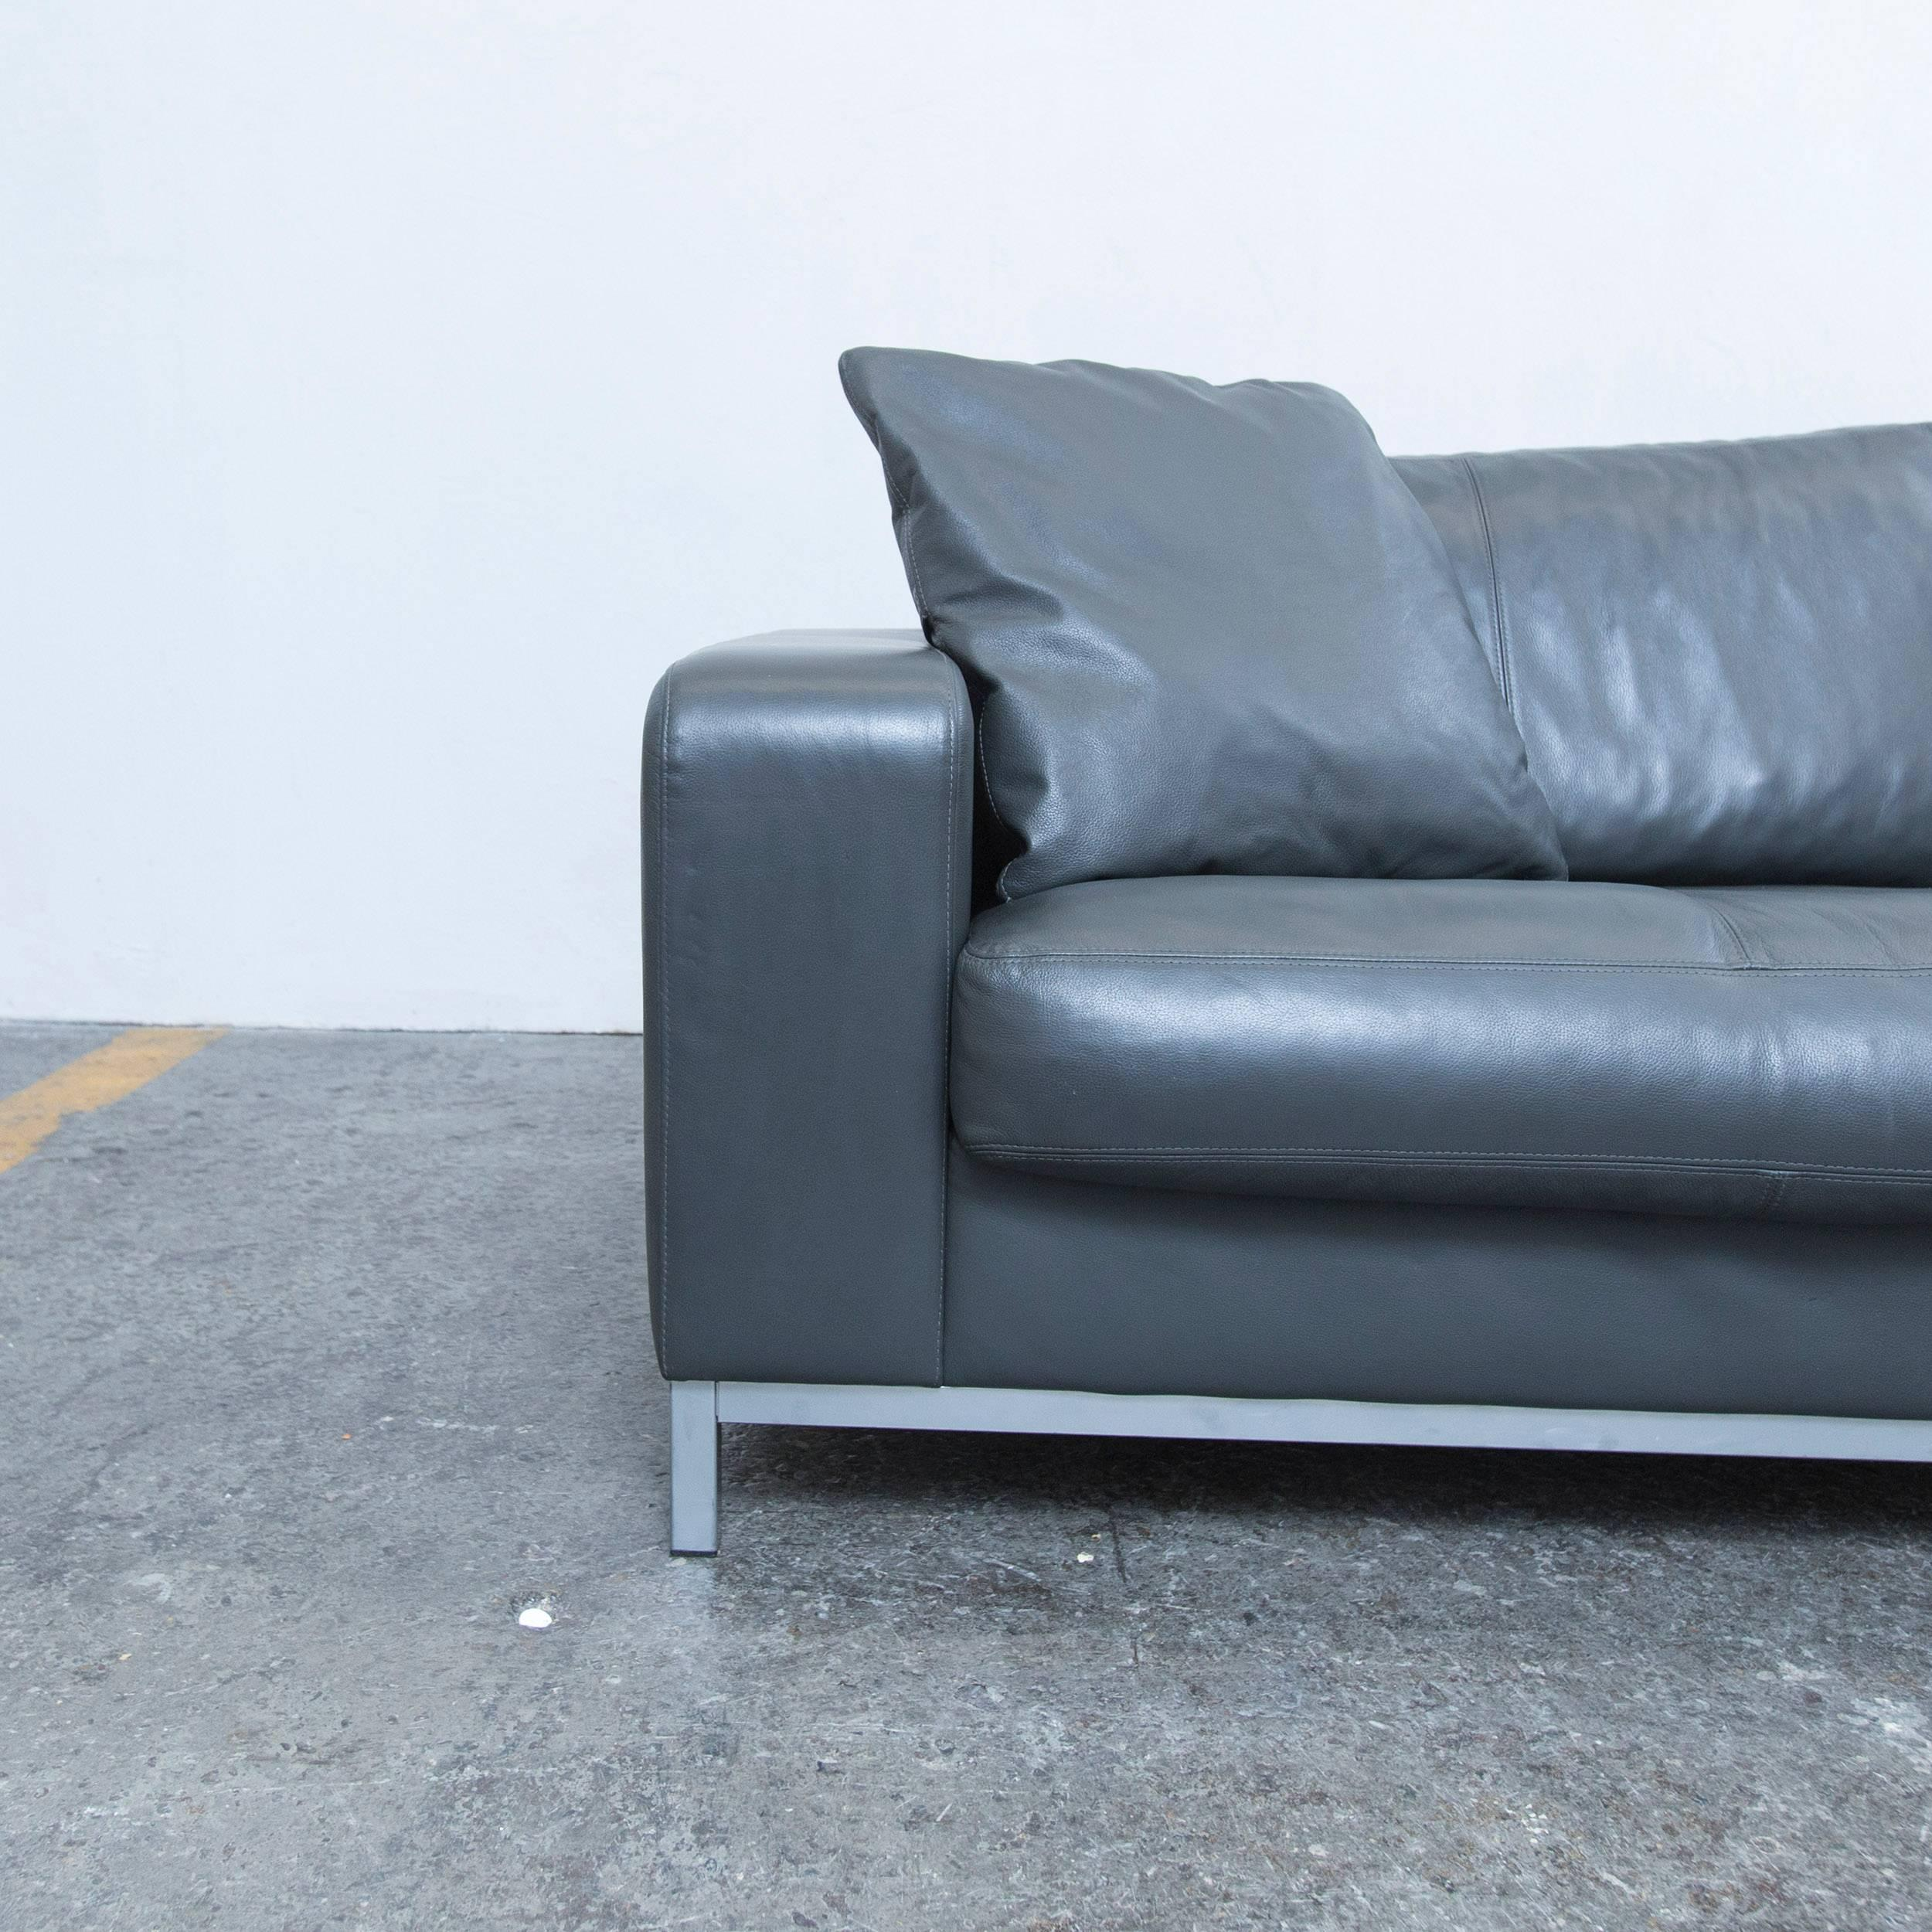 Grey Colored Original Machalke Designer Leather Sofa In A Modern And  Minimalistic Design, Made For